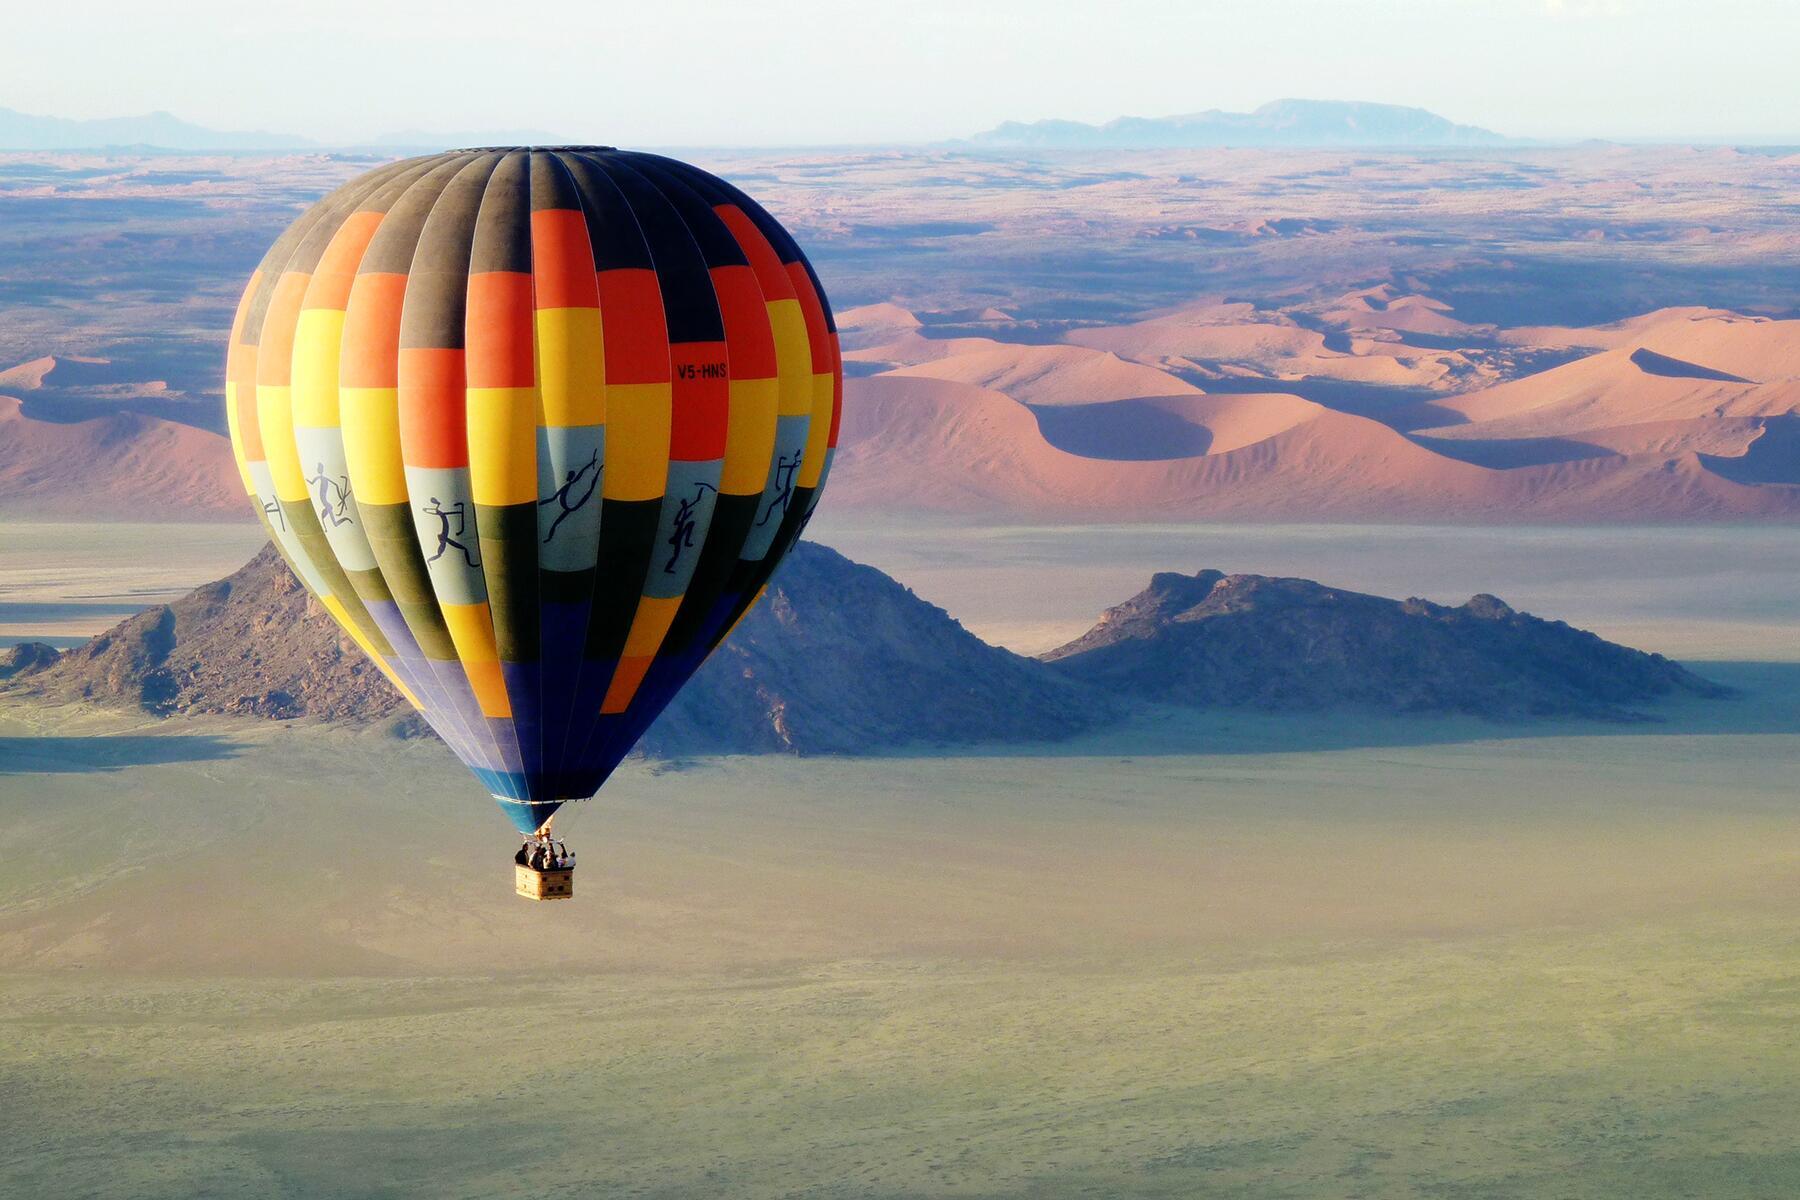 13_UnexpectedHoneymoons__SoarHighAbovetheNamibianDesert_13.) Balloon In Dramatic Landscape